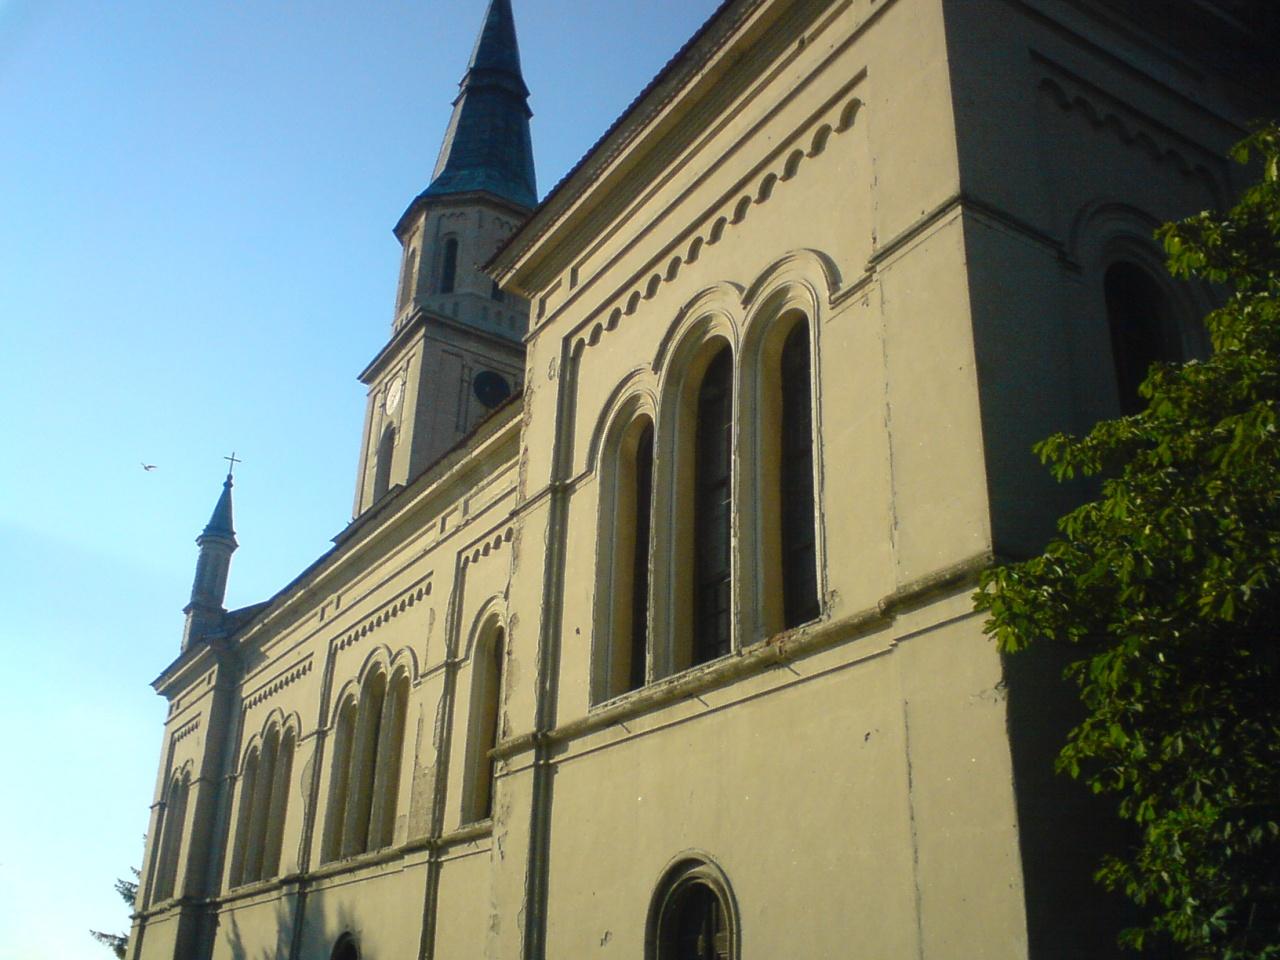 FileRoman Catholic Church Of St John The Baptist Ecka